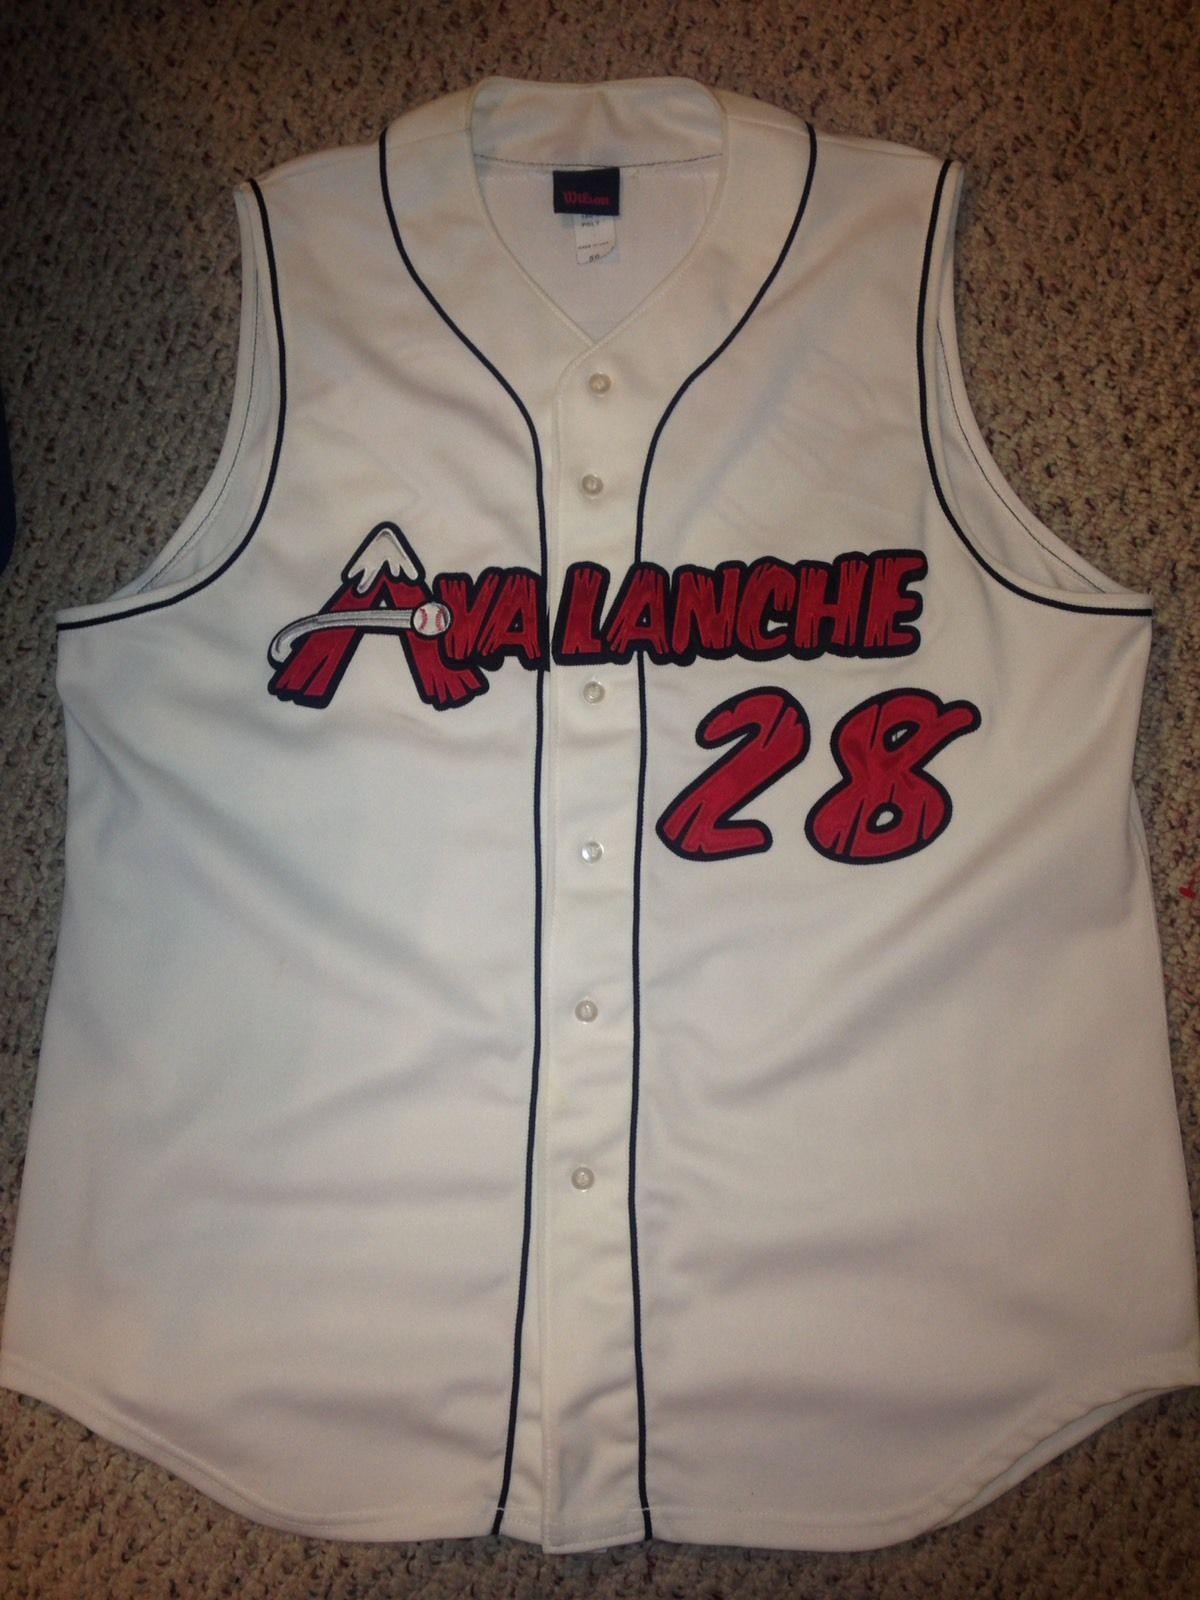 c816c4e60 2006 Salem Avalanche Rob Stiehl Game Worn Baseball Jersey Size 50 ...